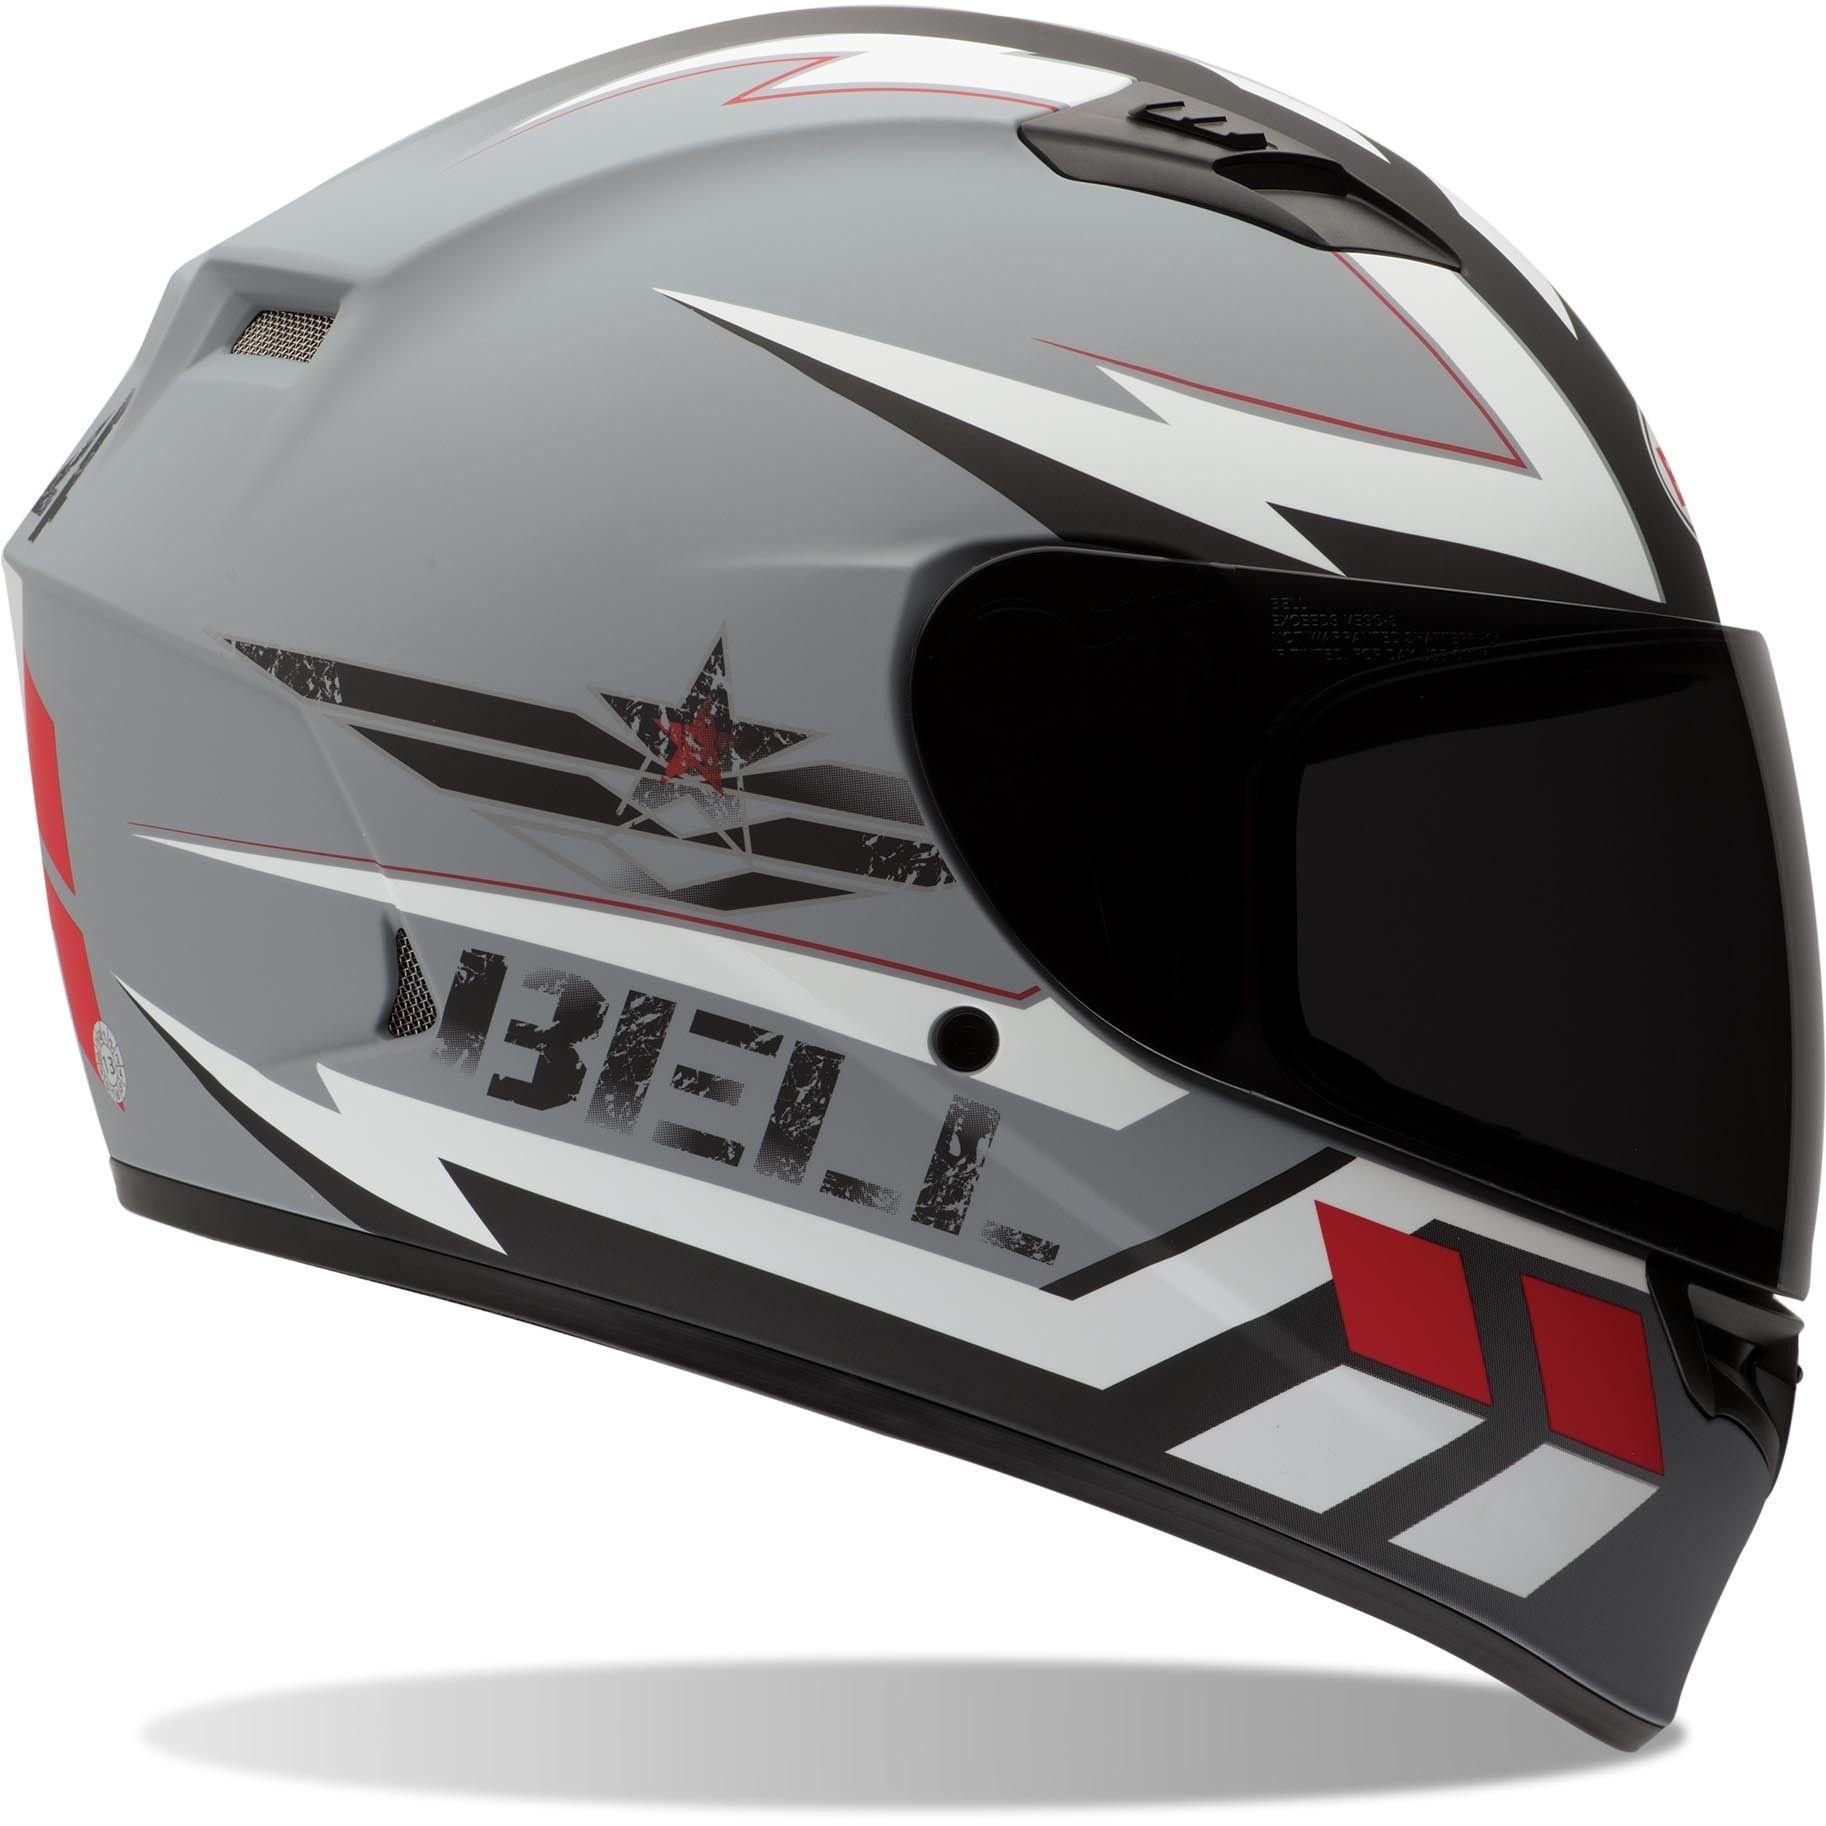 31176b454bce5 Bell Qualifier Legion Helmet